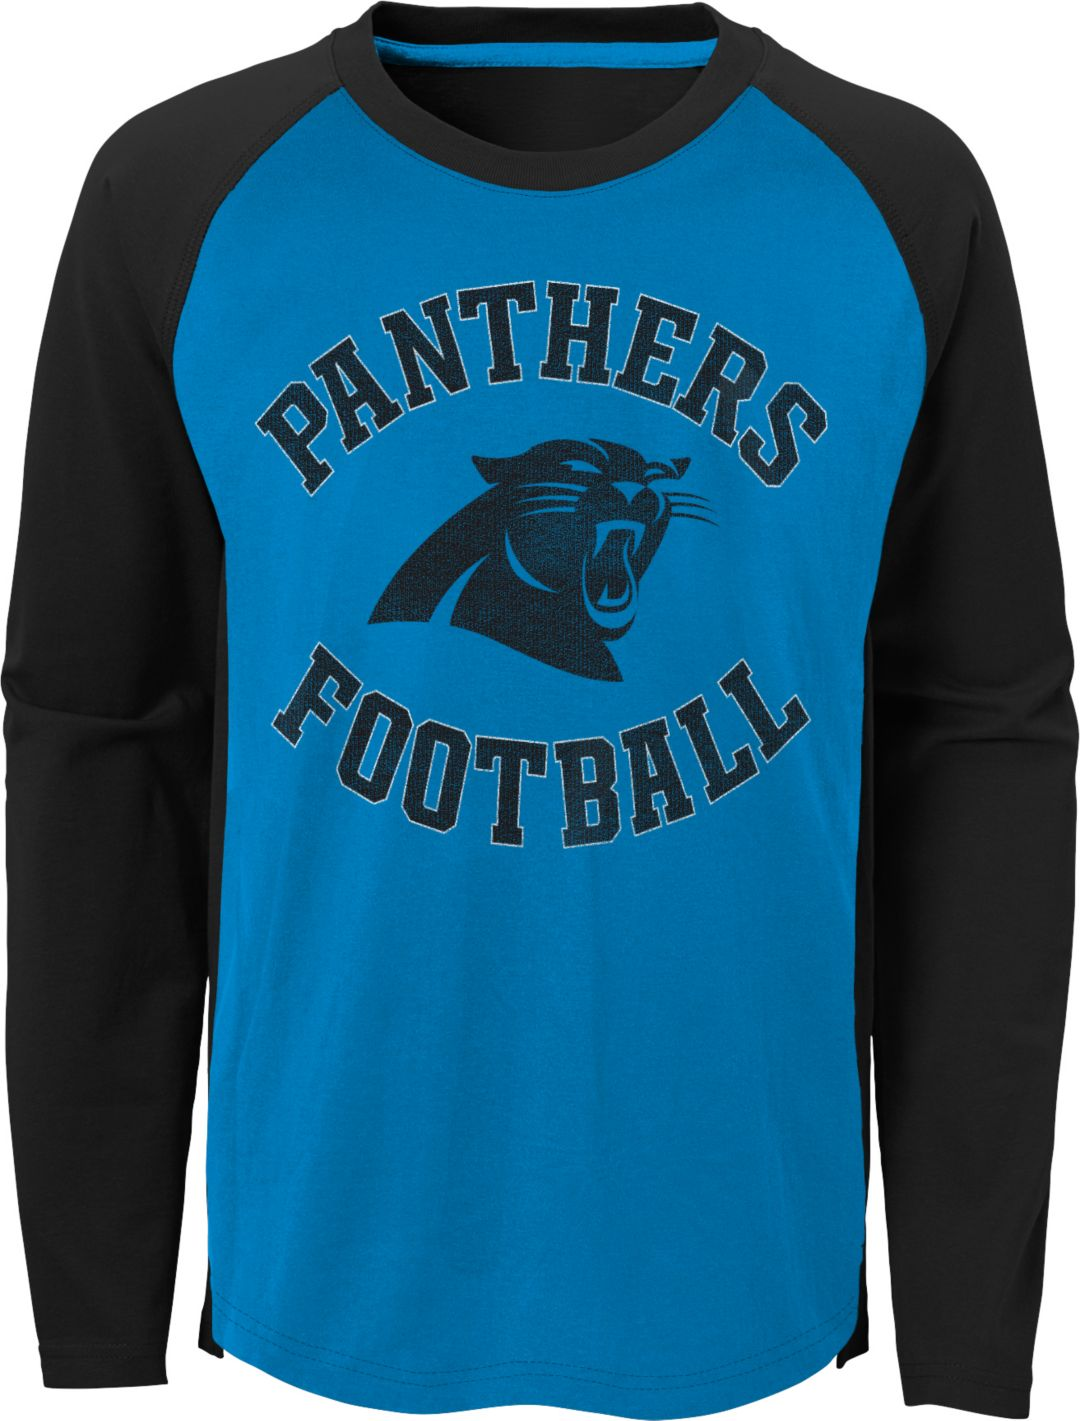 separation shoes 6634d 4c59f NFL Team Apparel Youth Carolina Panthers Air Raid Long Sleeve Black Shirt